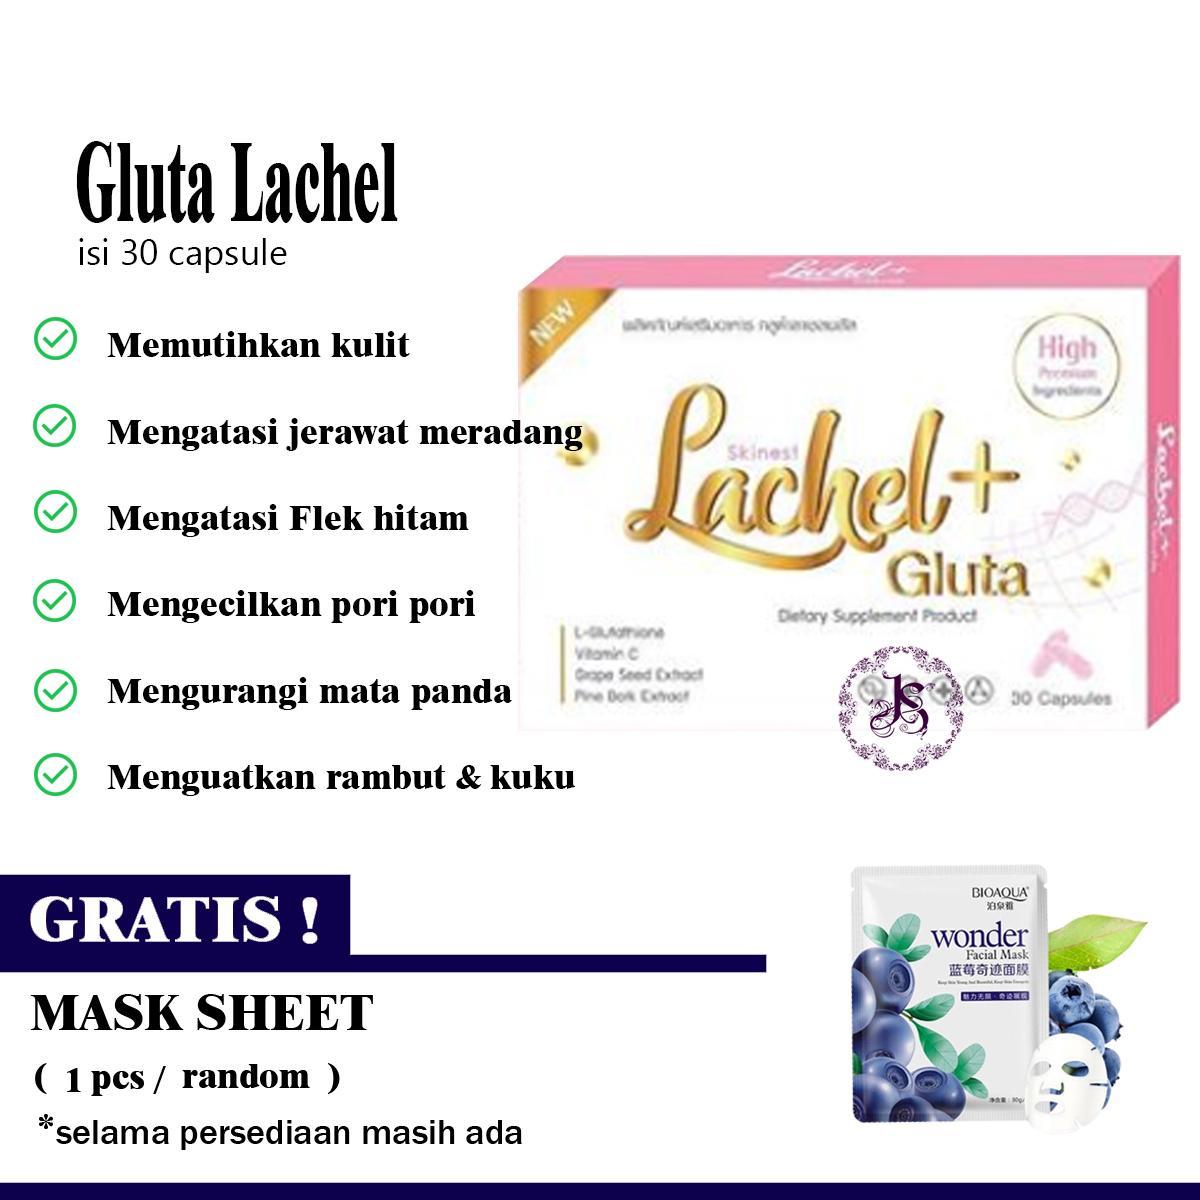 Pemutih Kulit Gluta Lachel Isi 30 Capsule Original Thailand By Joanna Secrets By Joanna Secrets.